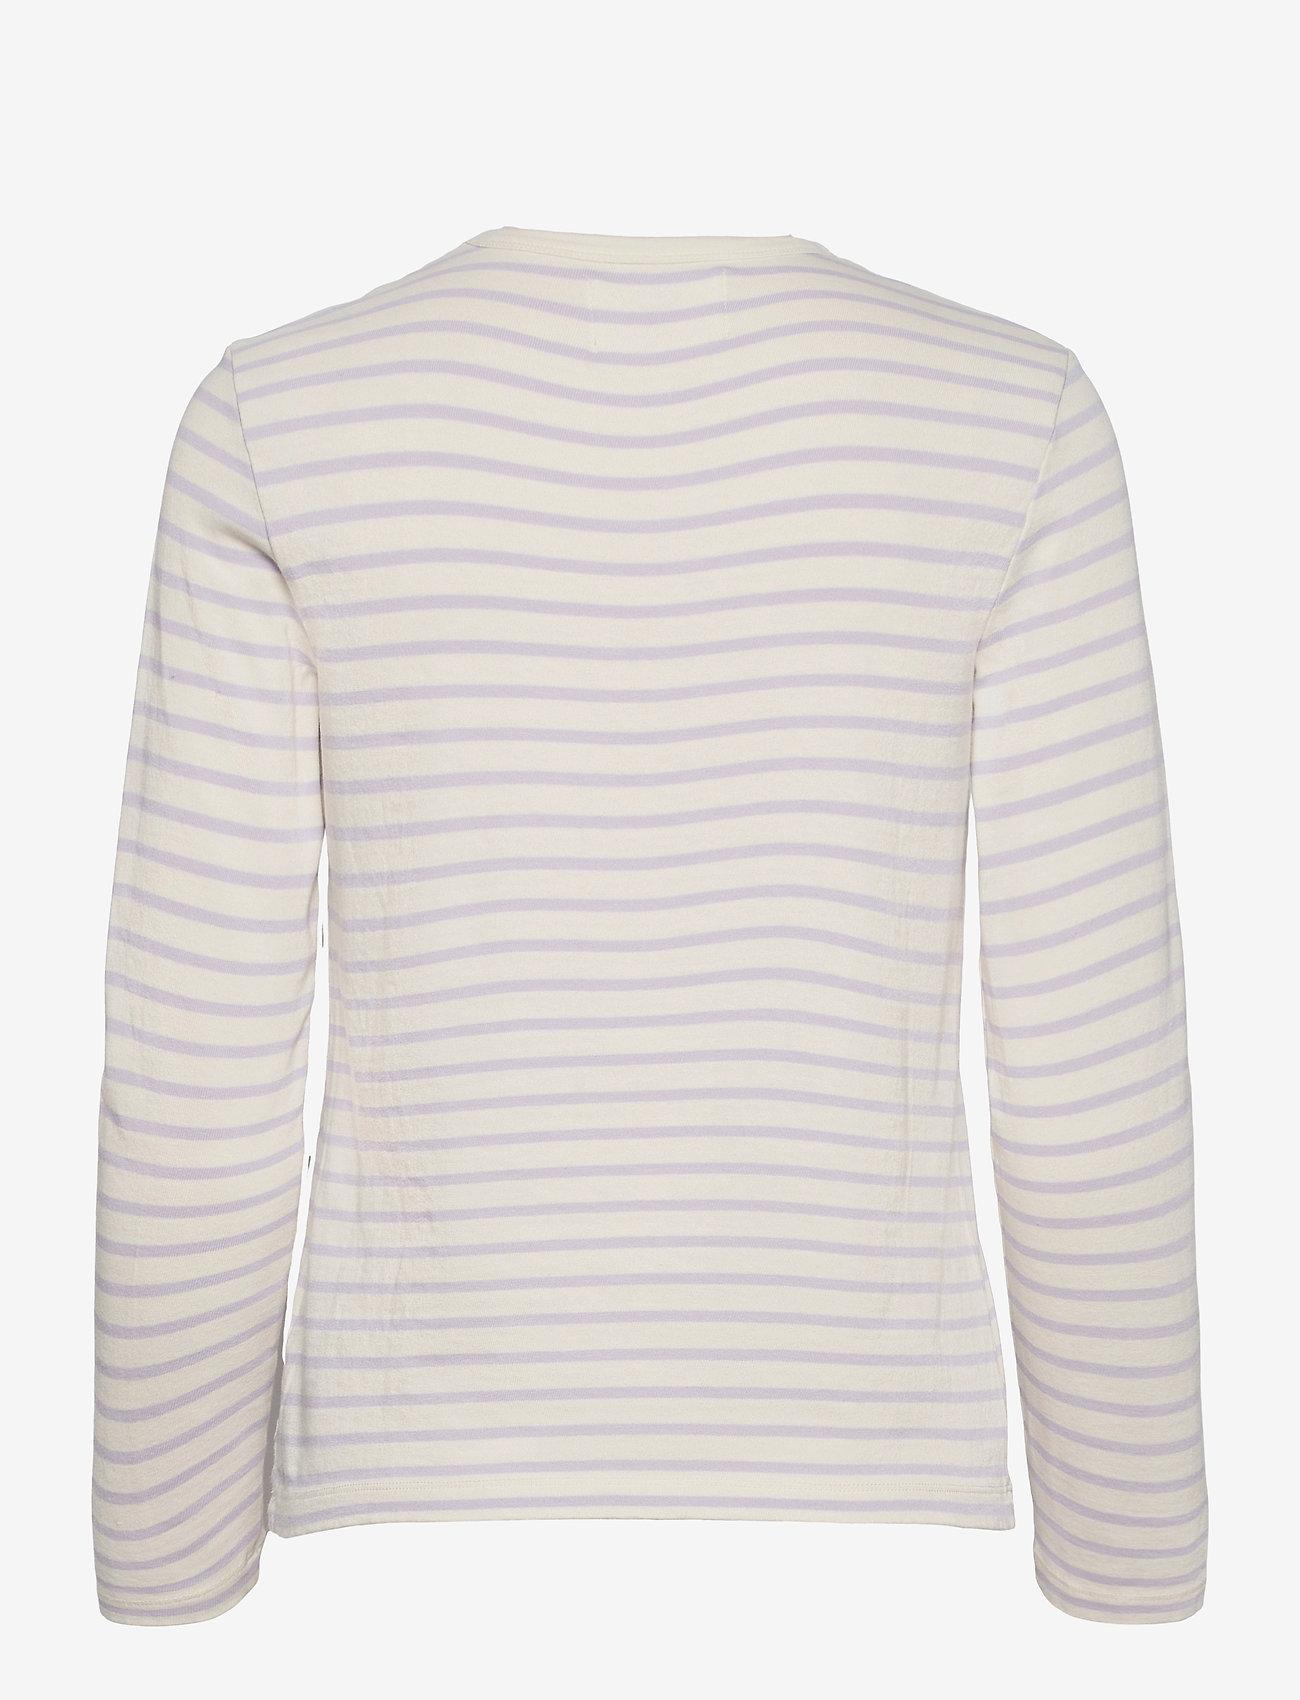 Wood Wood - Moa long sleeve - langærmede toppe - off-white/lilac stripes - 1